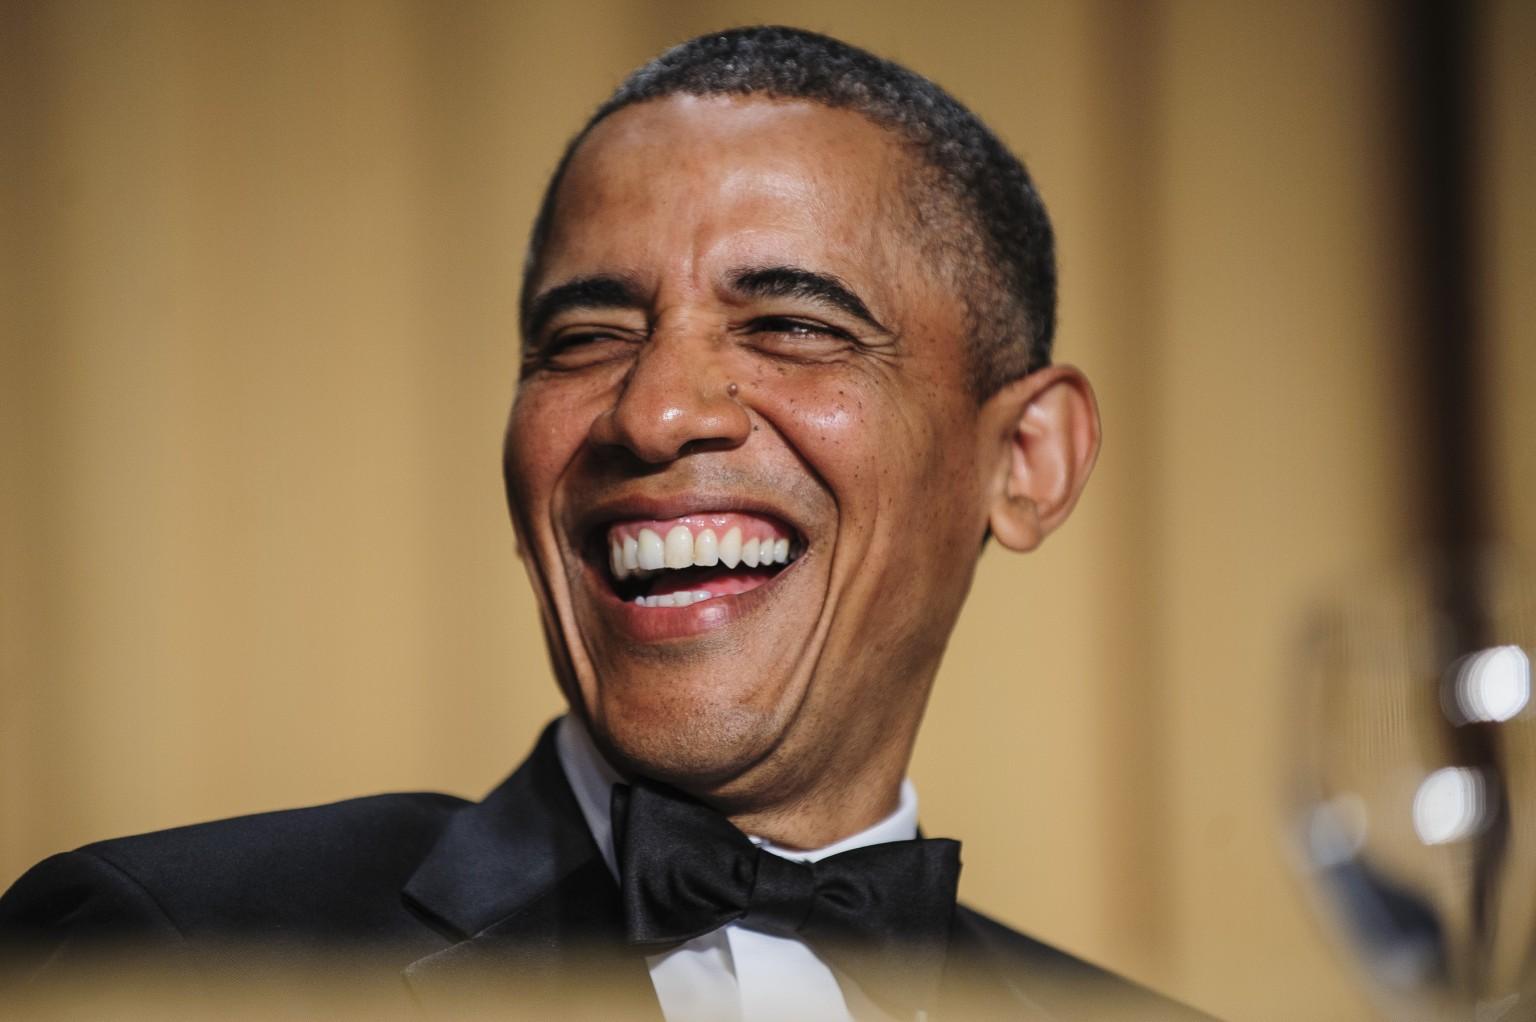 pussy-sarah-obama-facial-expressions-pics-girl-high